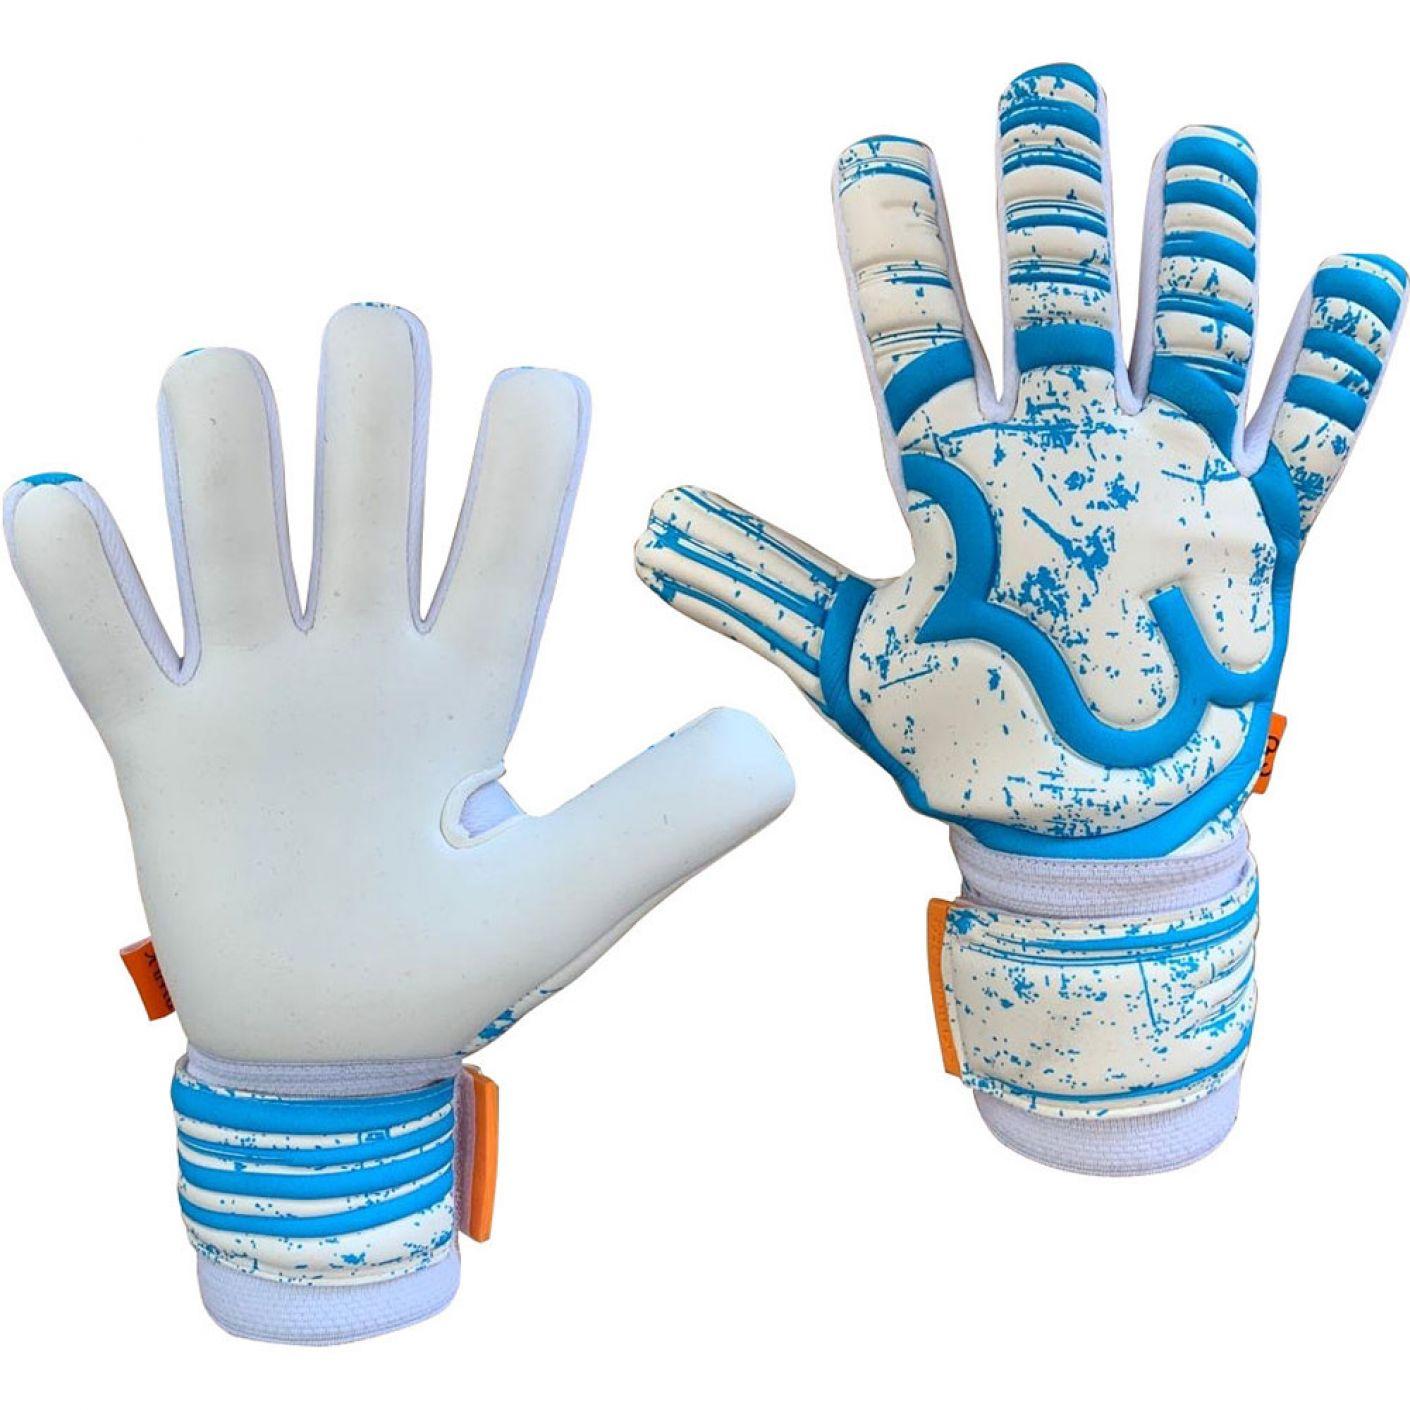 RWLK Future I Keepershandschoenen Wit Blauw